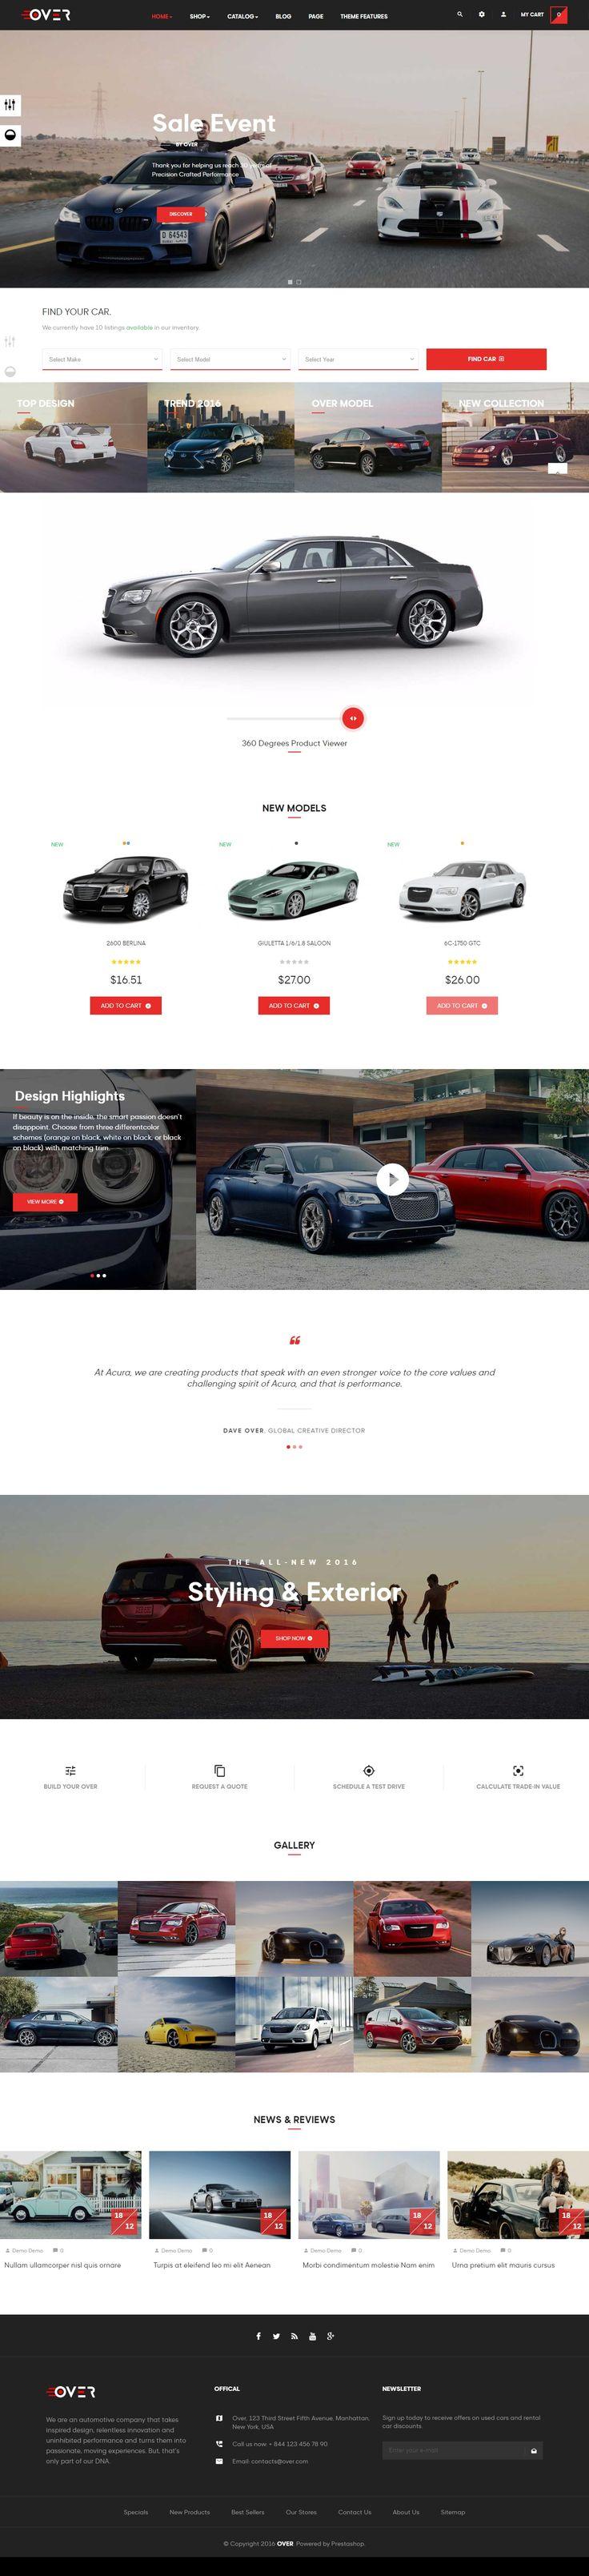 #YesThemes.net - Free download Leo Over Responsive Prestashop Theme This is a #Prestashop #theme for #car, #auto, #garage